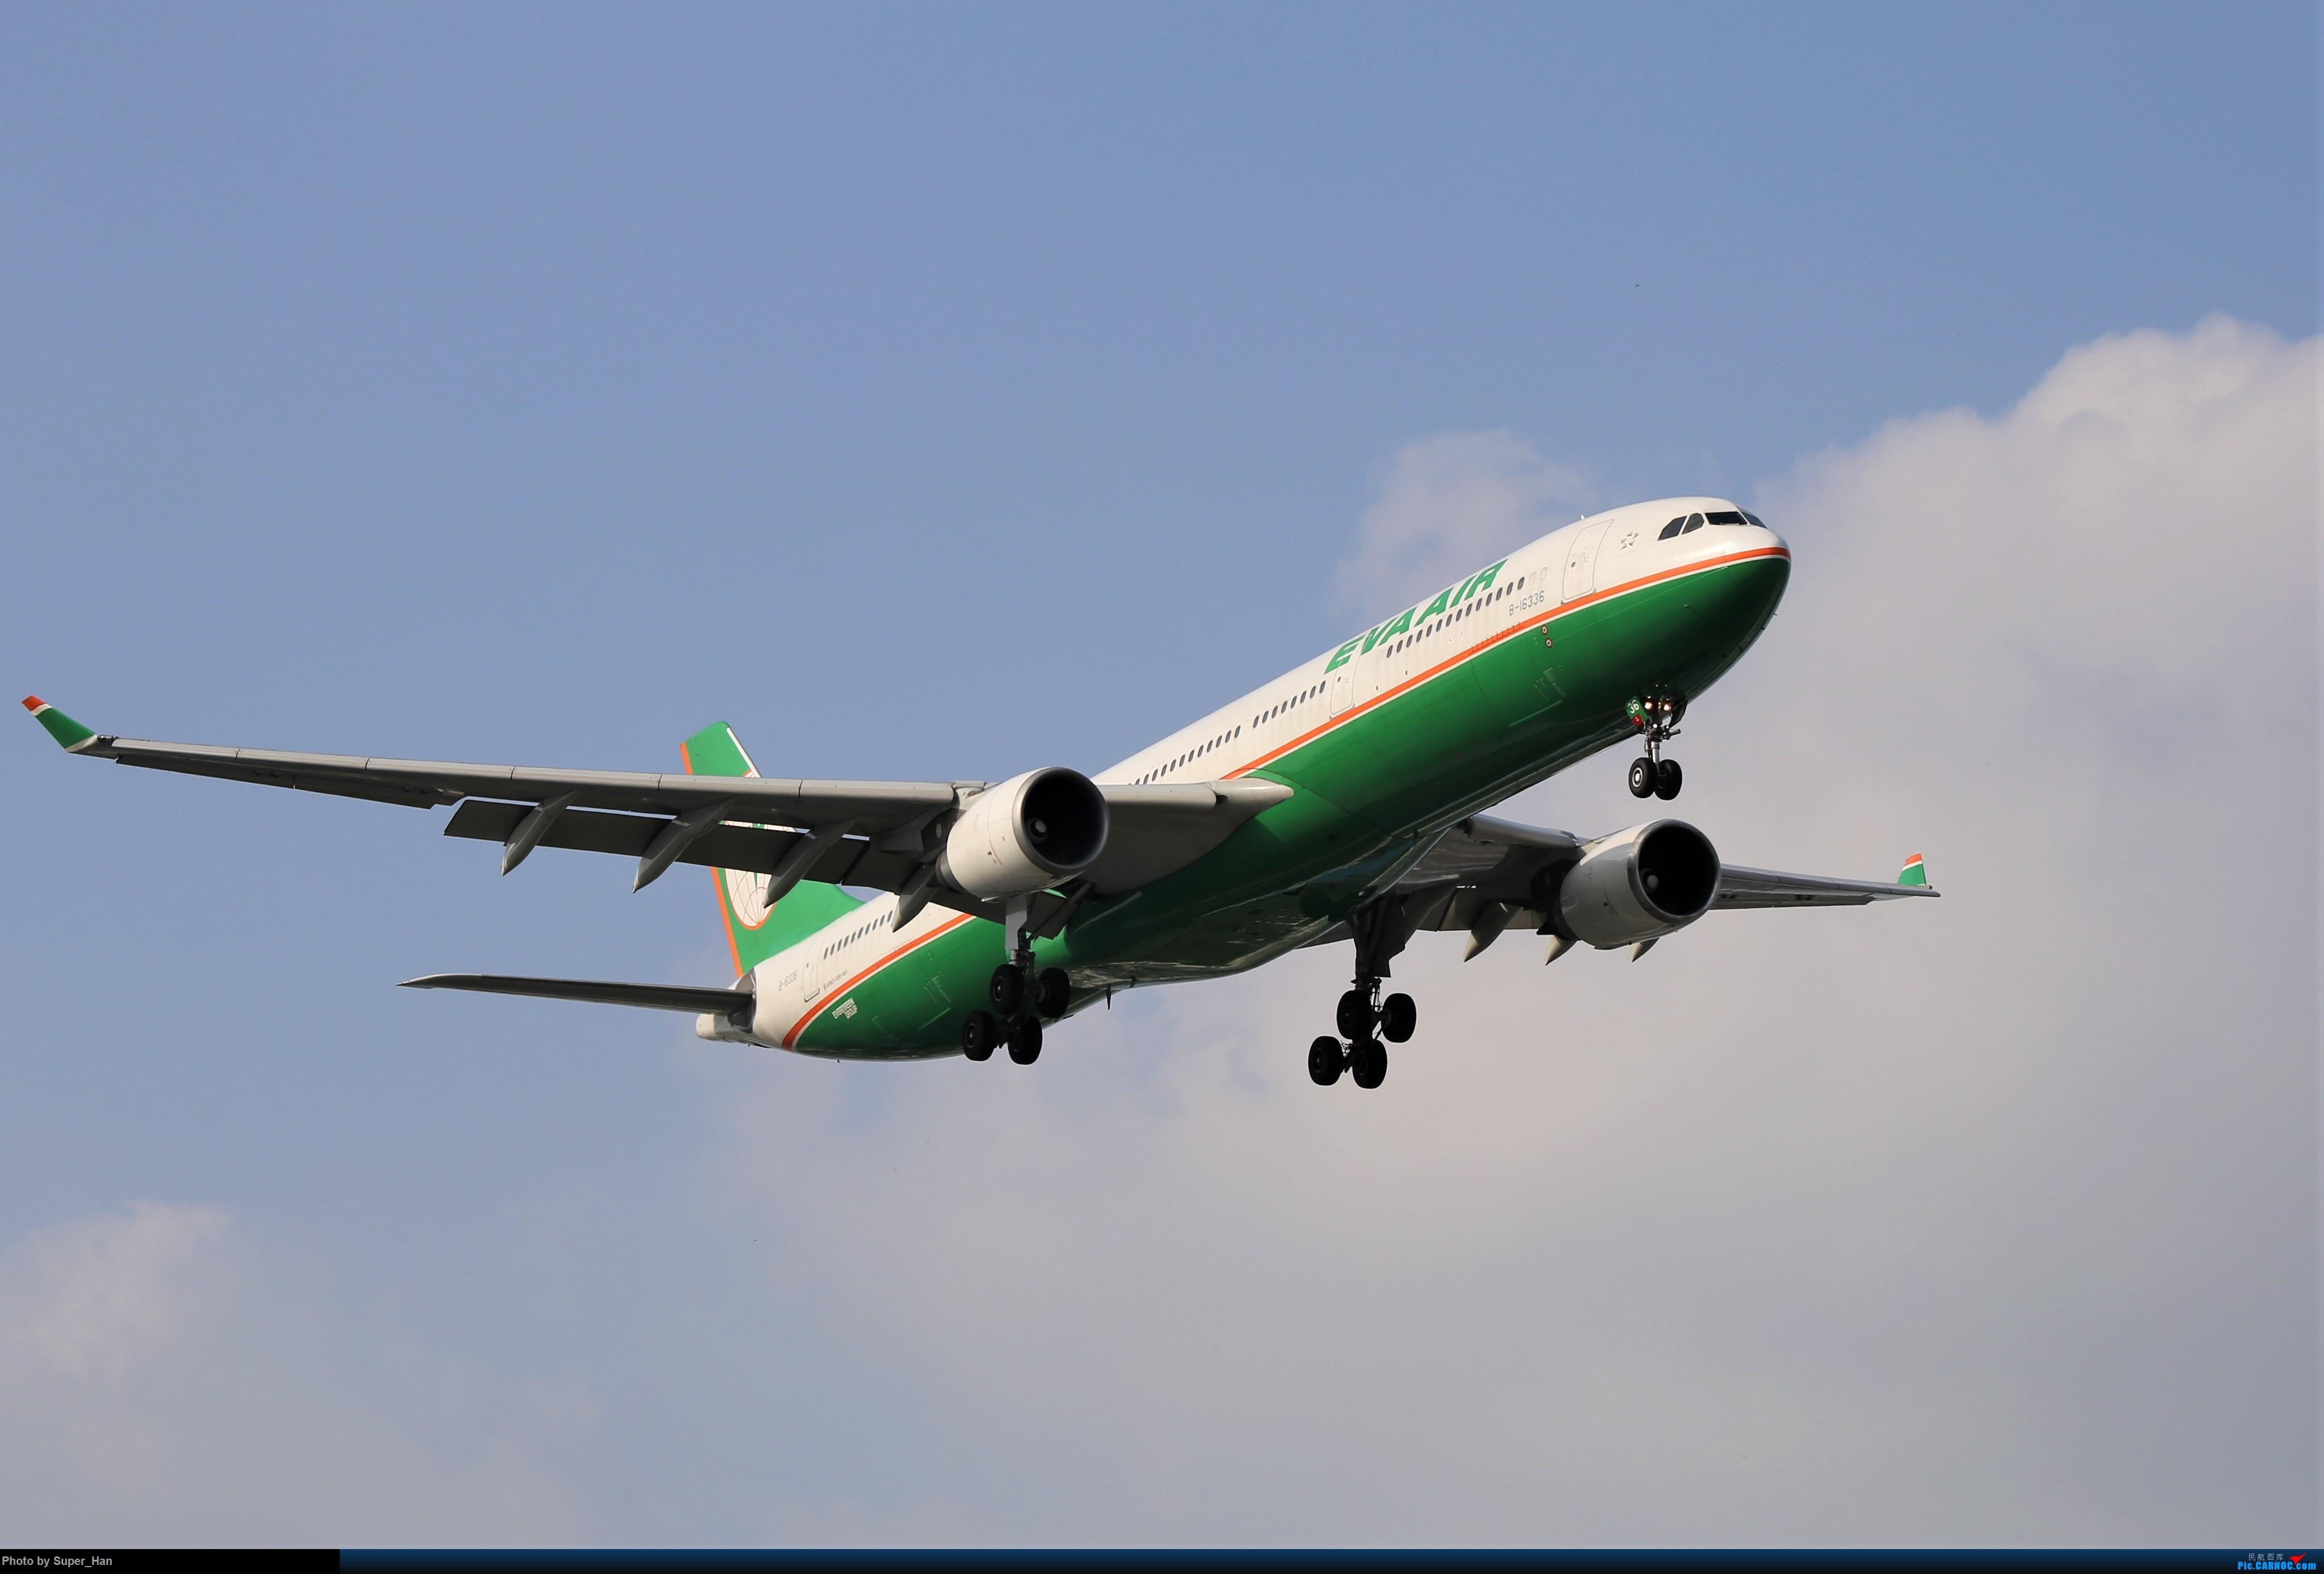 Re:[原创]0715去虹桥说走就走【最多的330篇】 AIRBUS A330-300 B-16336 中国上海虹桥国际机场